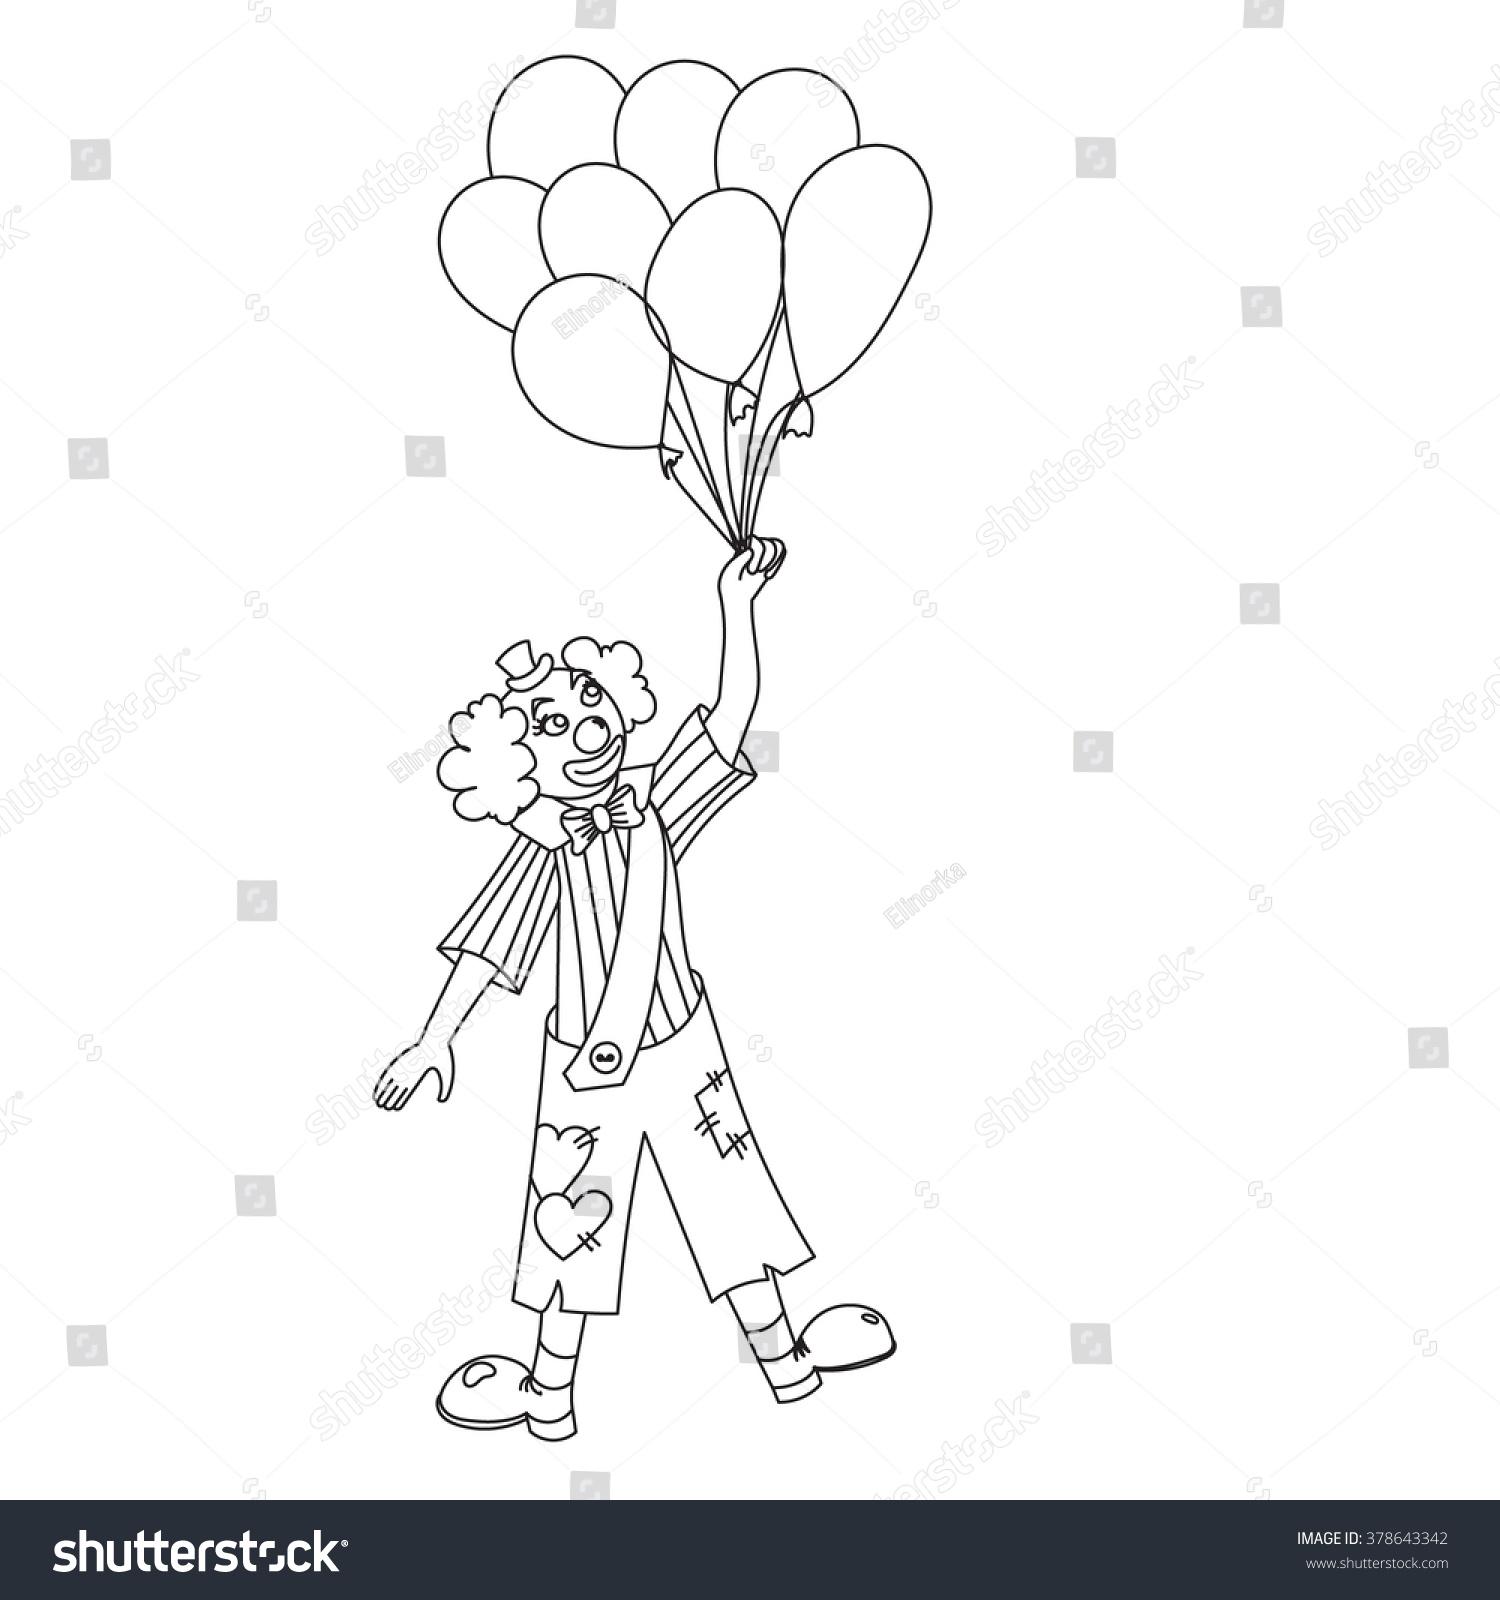 Hand Drawn Clown Clown Holding Balloons Stock Vector 378643342 ...